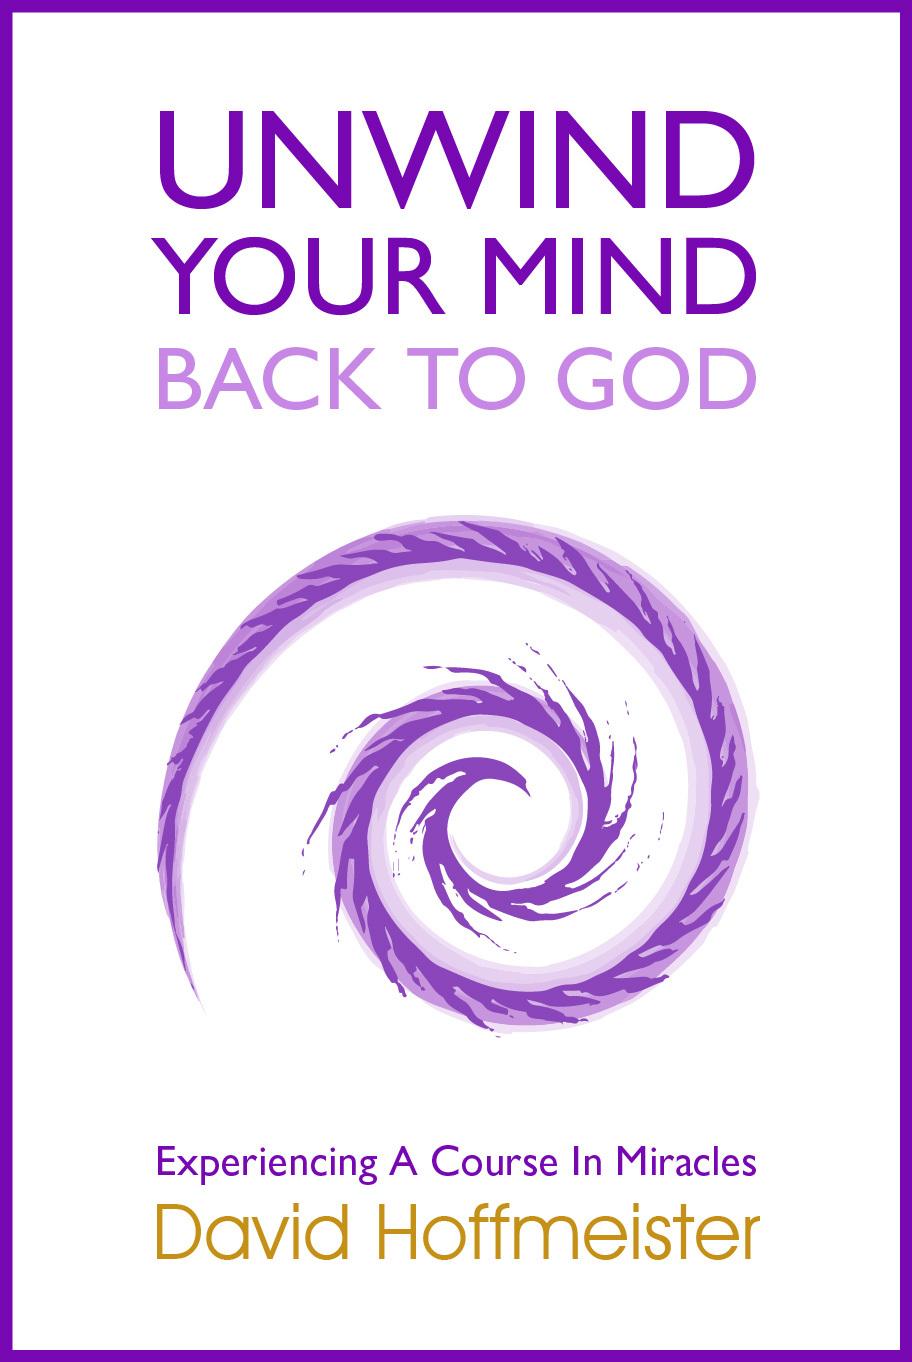 Unwind Your Mind - Back to God  by  David Hoffmeister